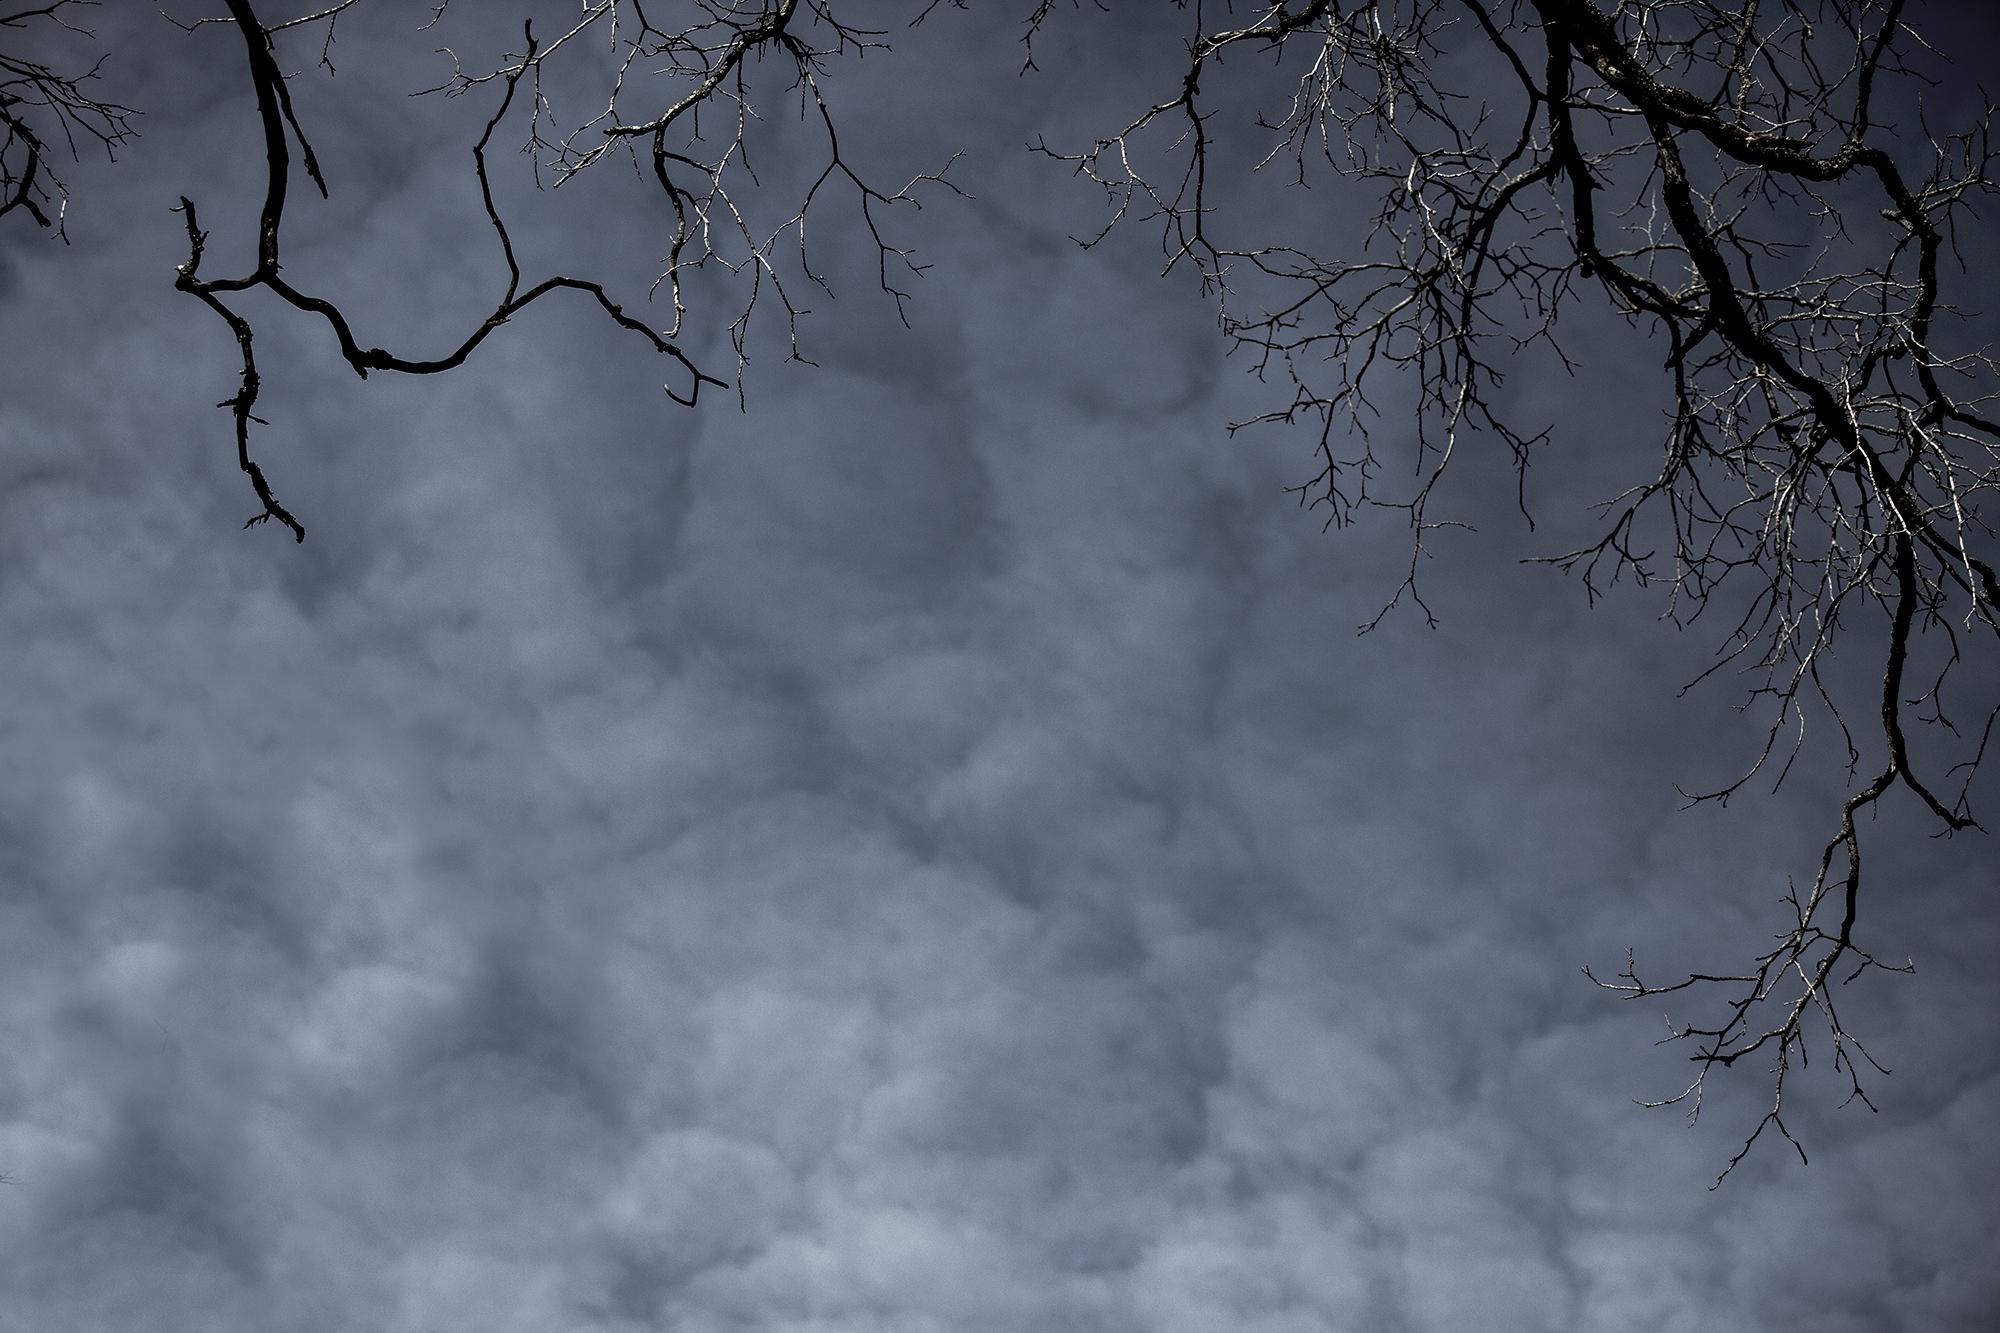 weather wax tree branch #2.jpg